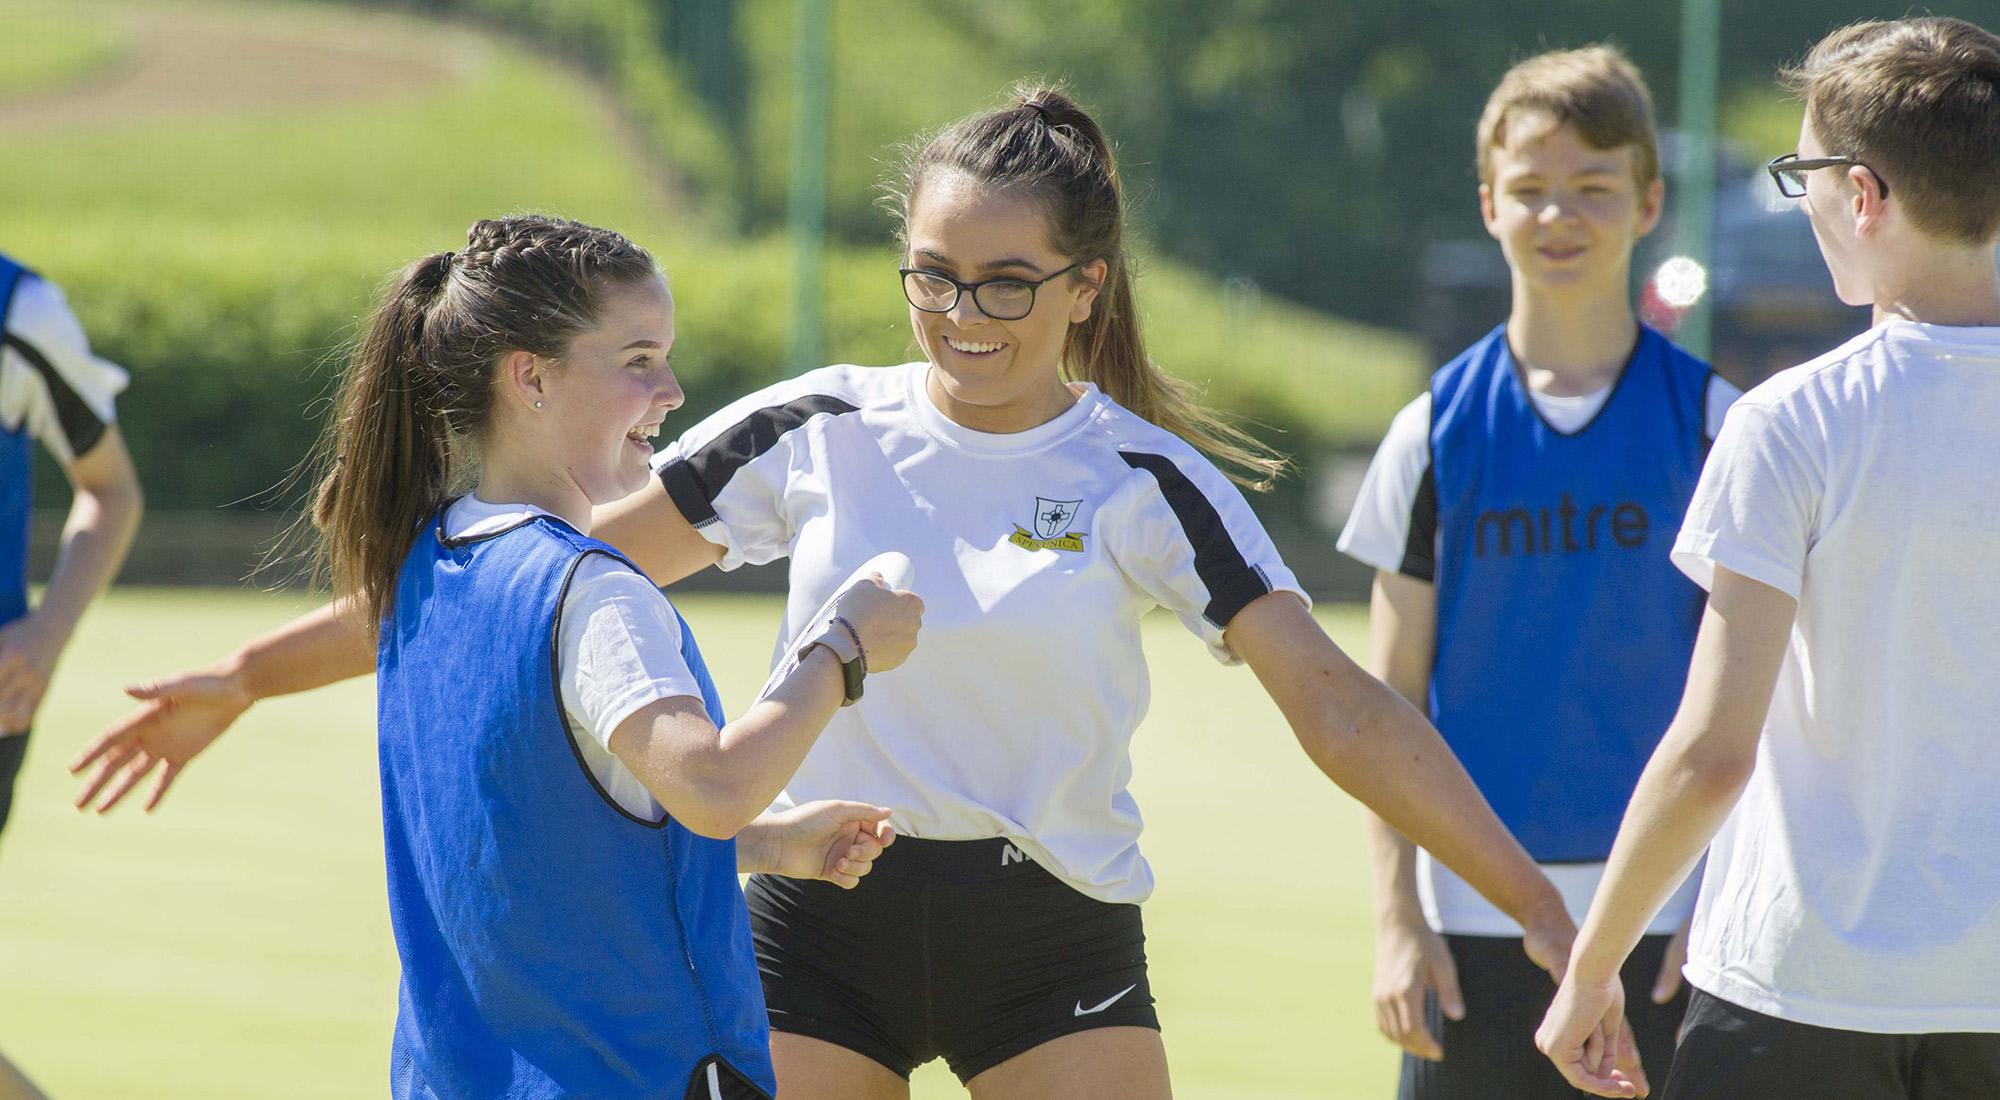 ukactive to lead UK's European Week of Sport 2018